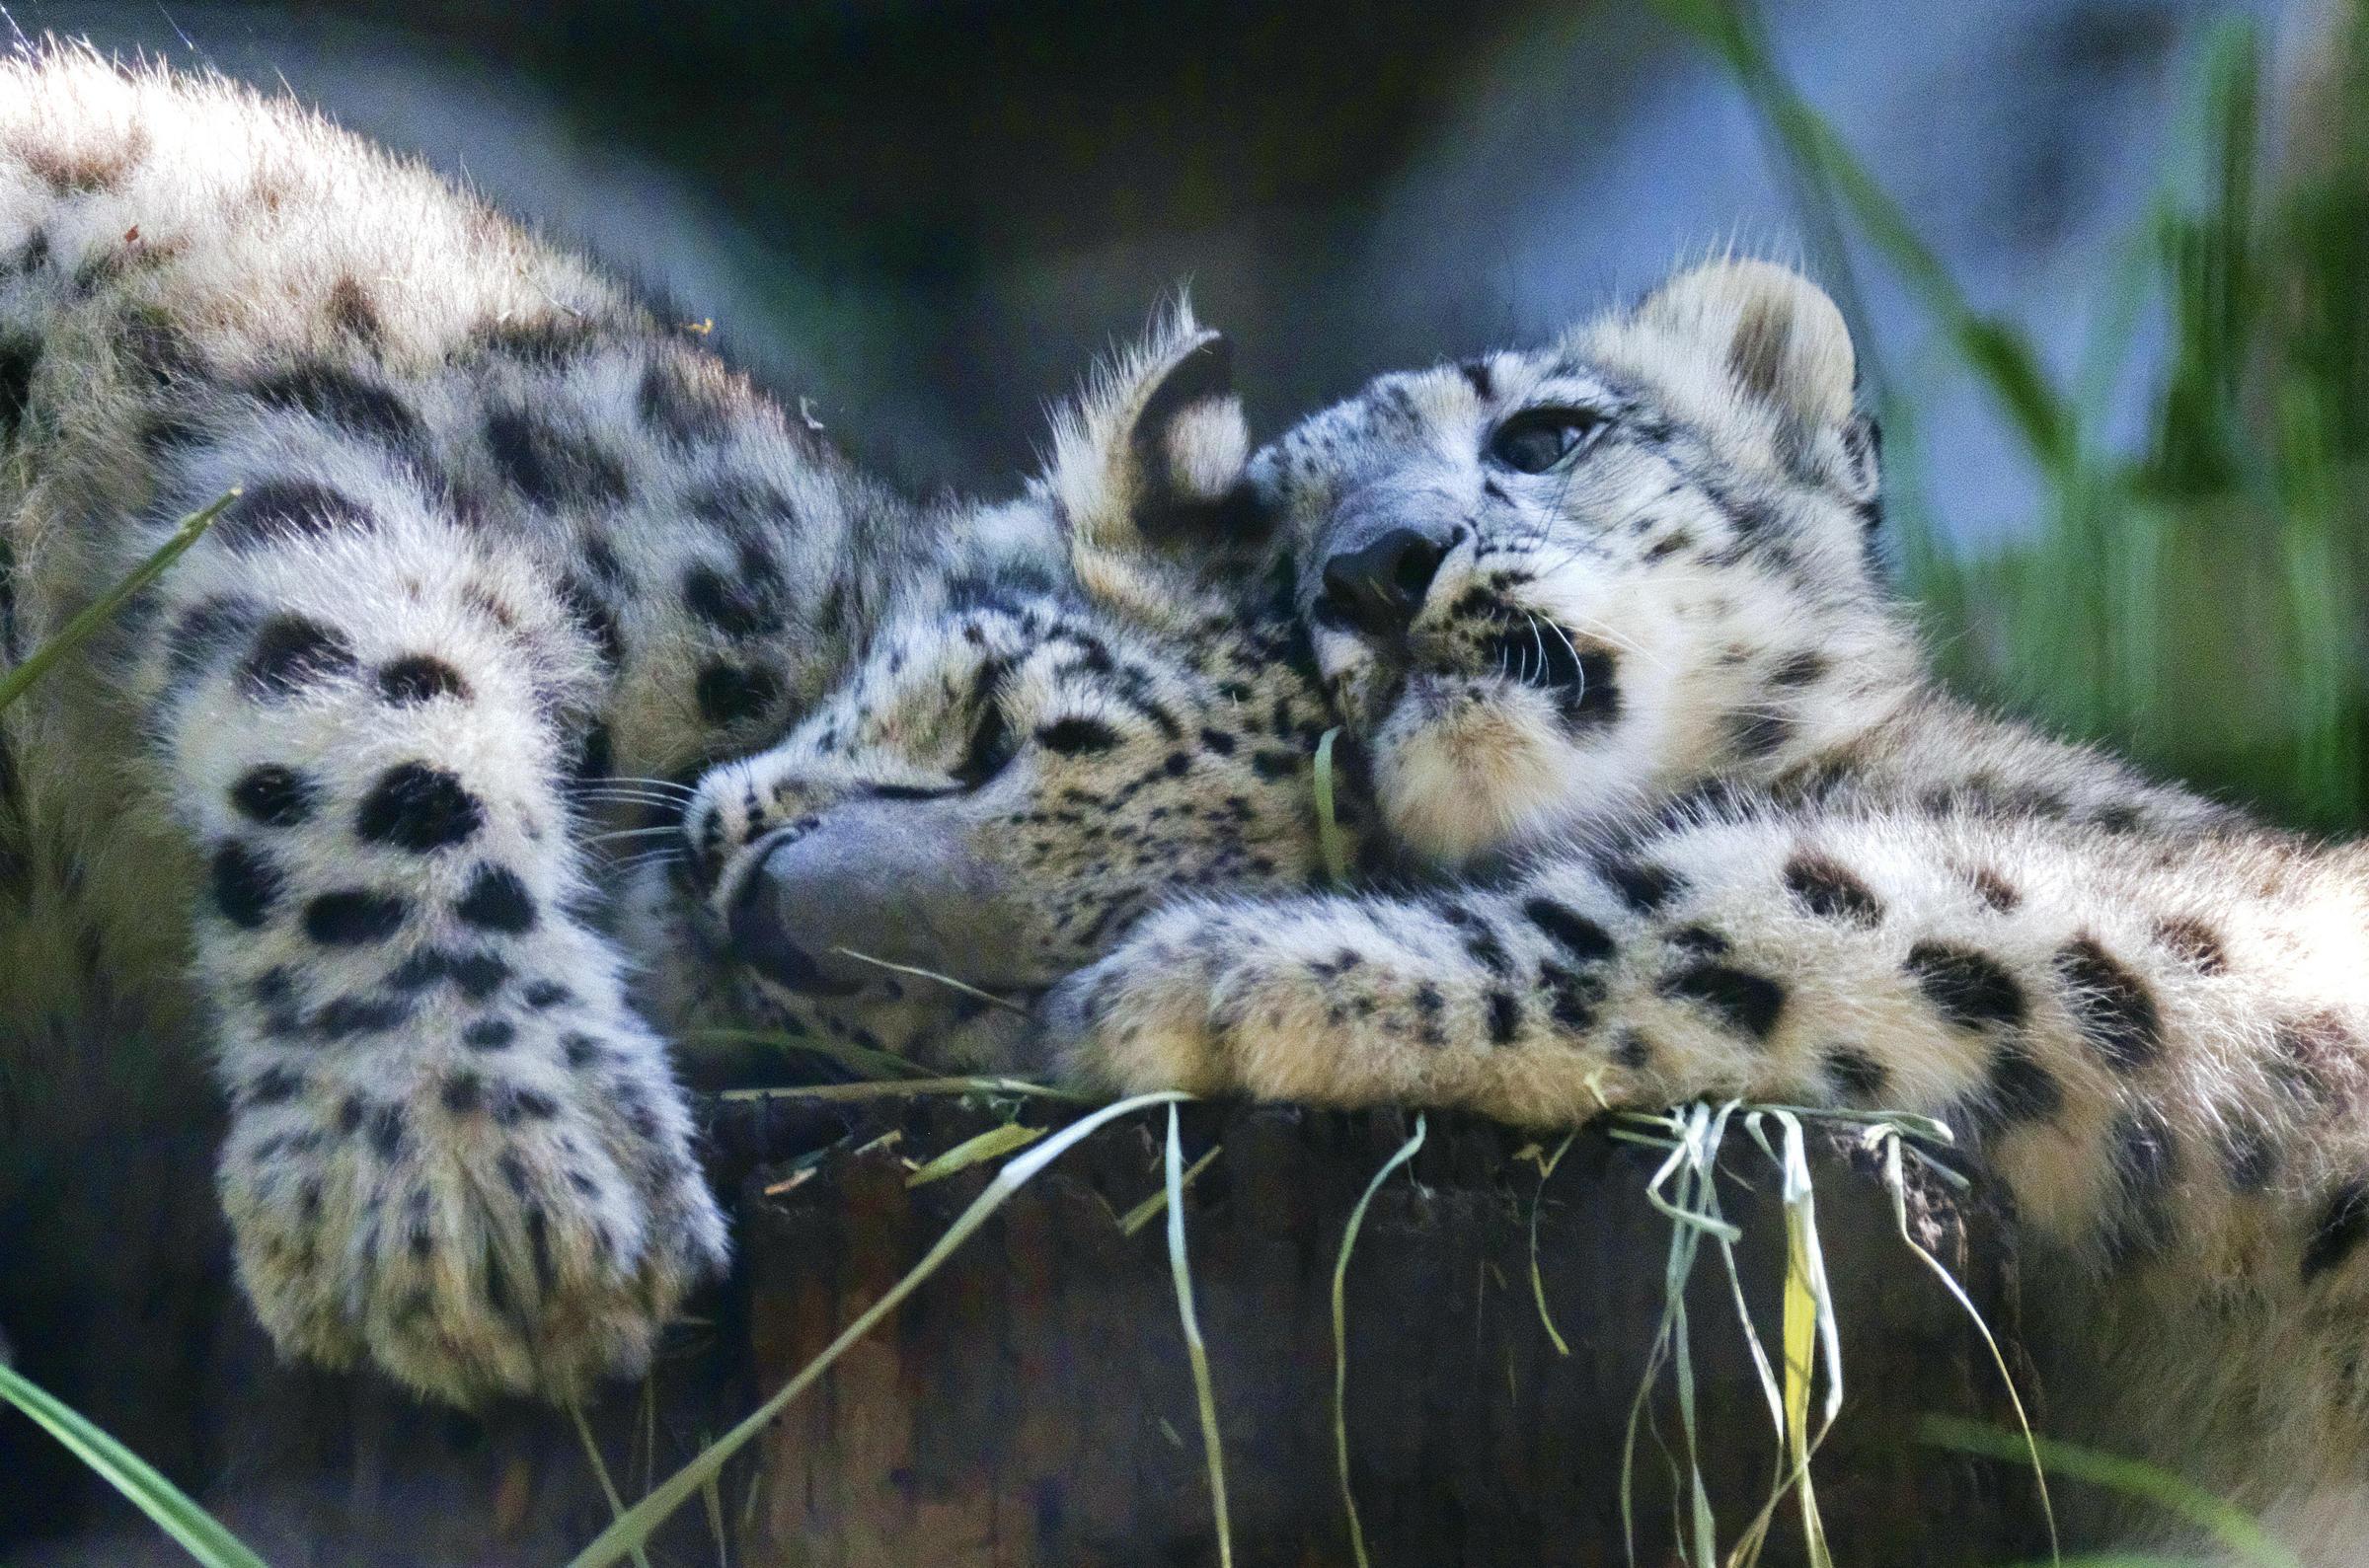 Snow leopard no longer considered an endangered species